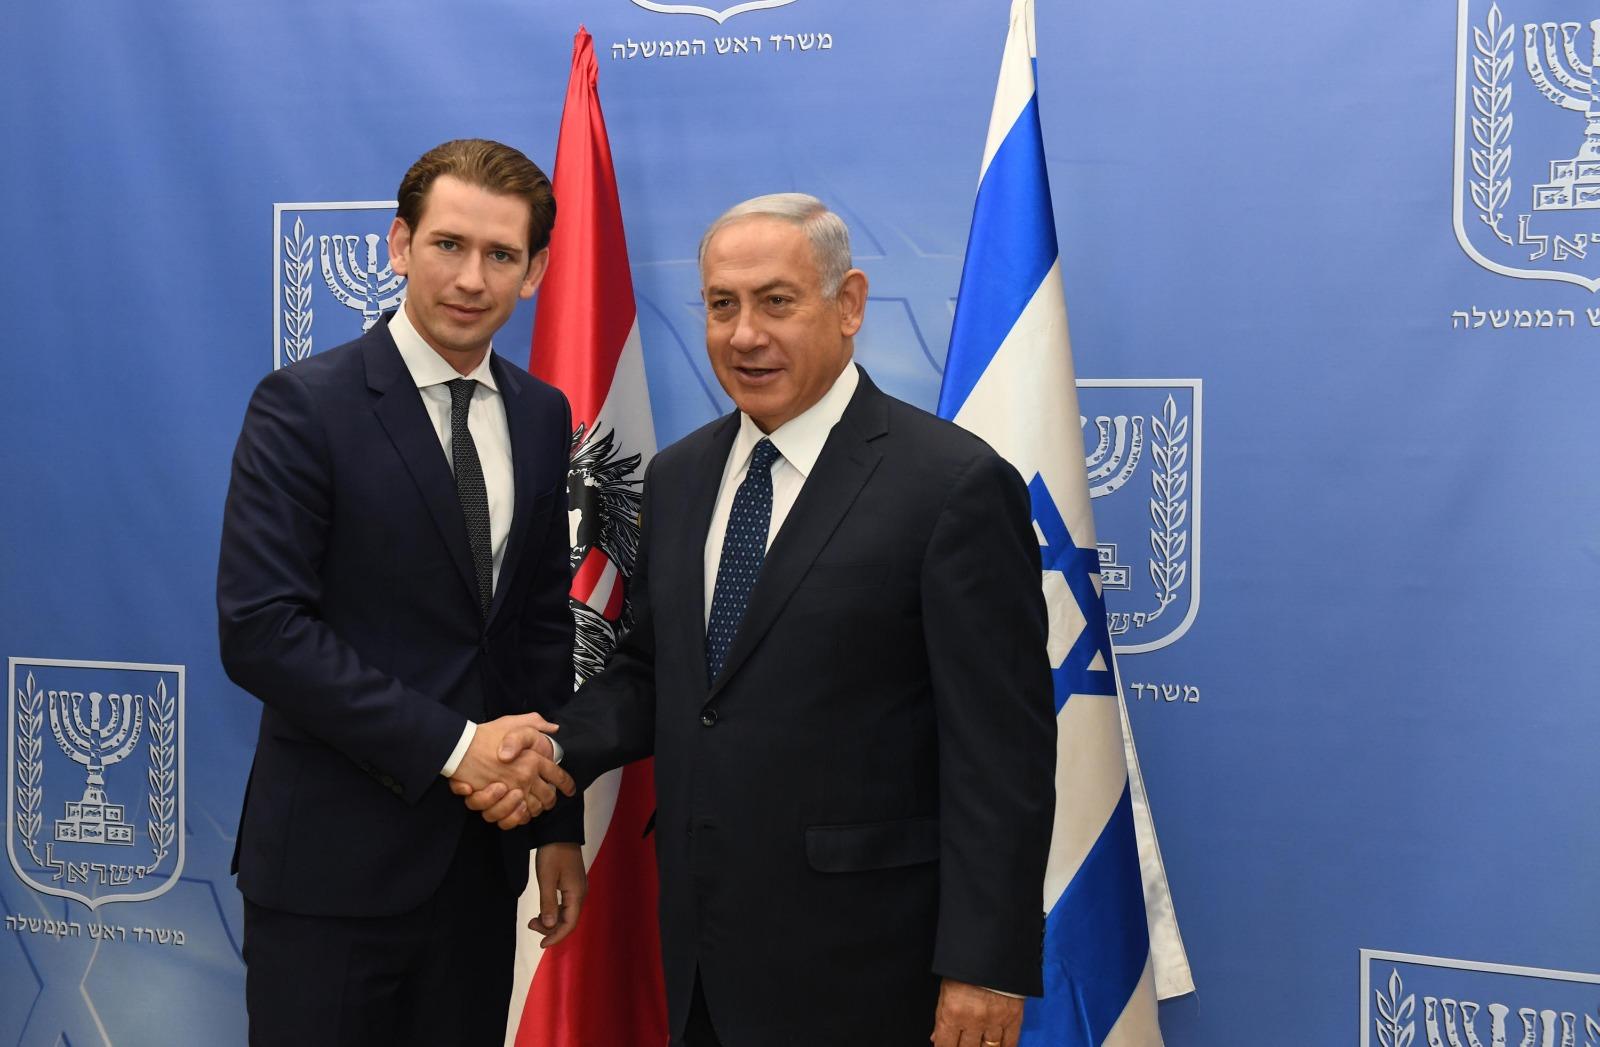 PM Netanyahu & Austrian Chancellor Kurz